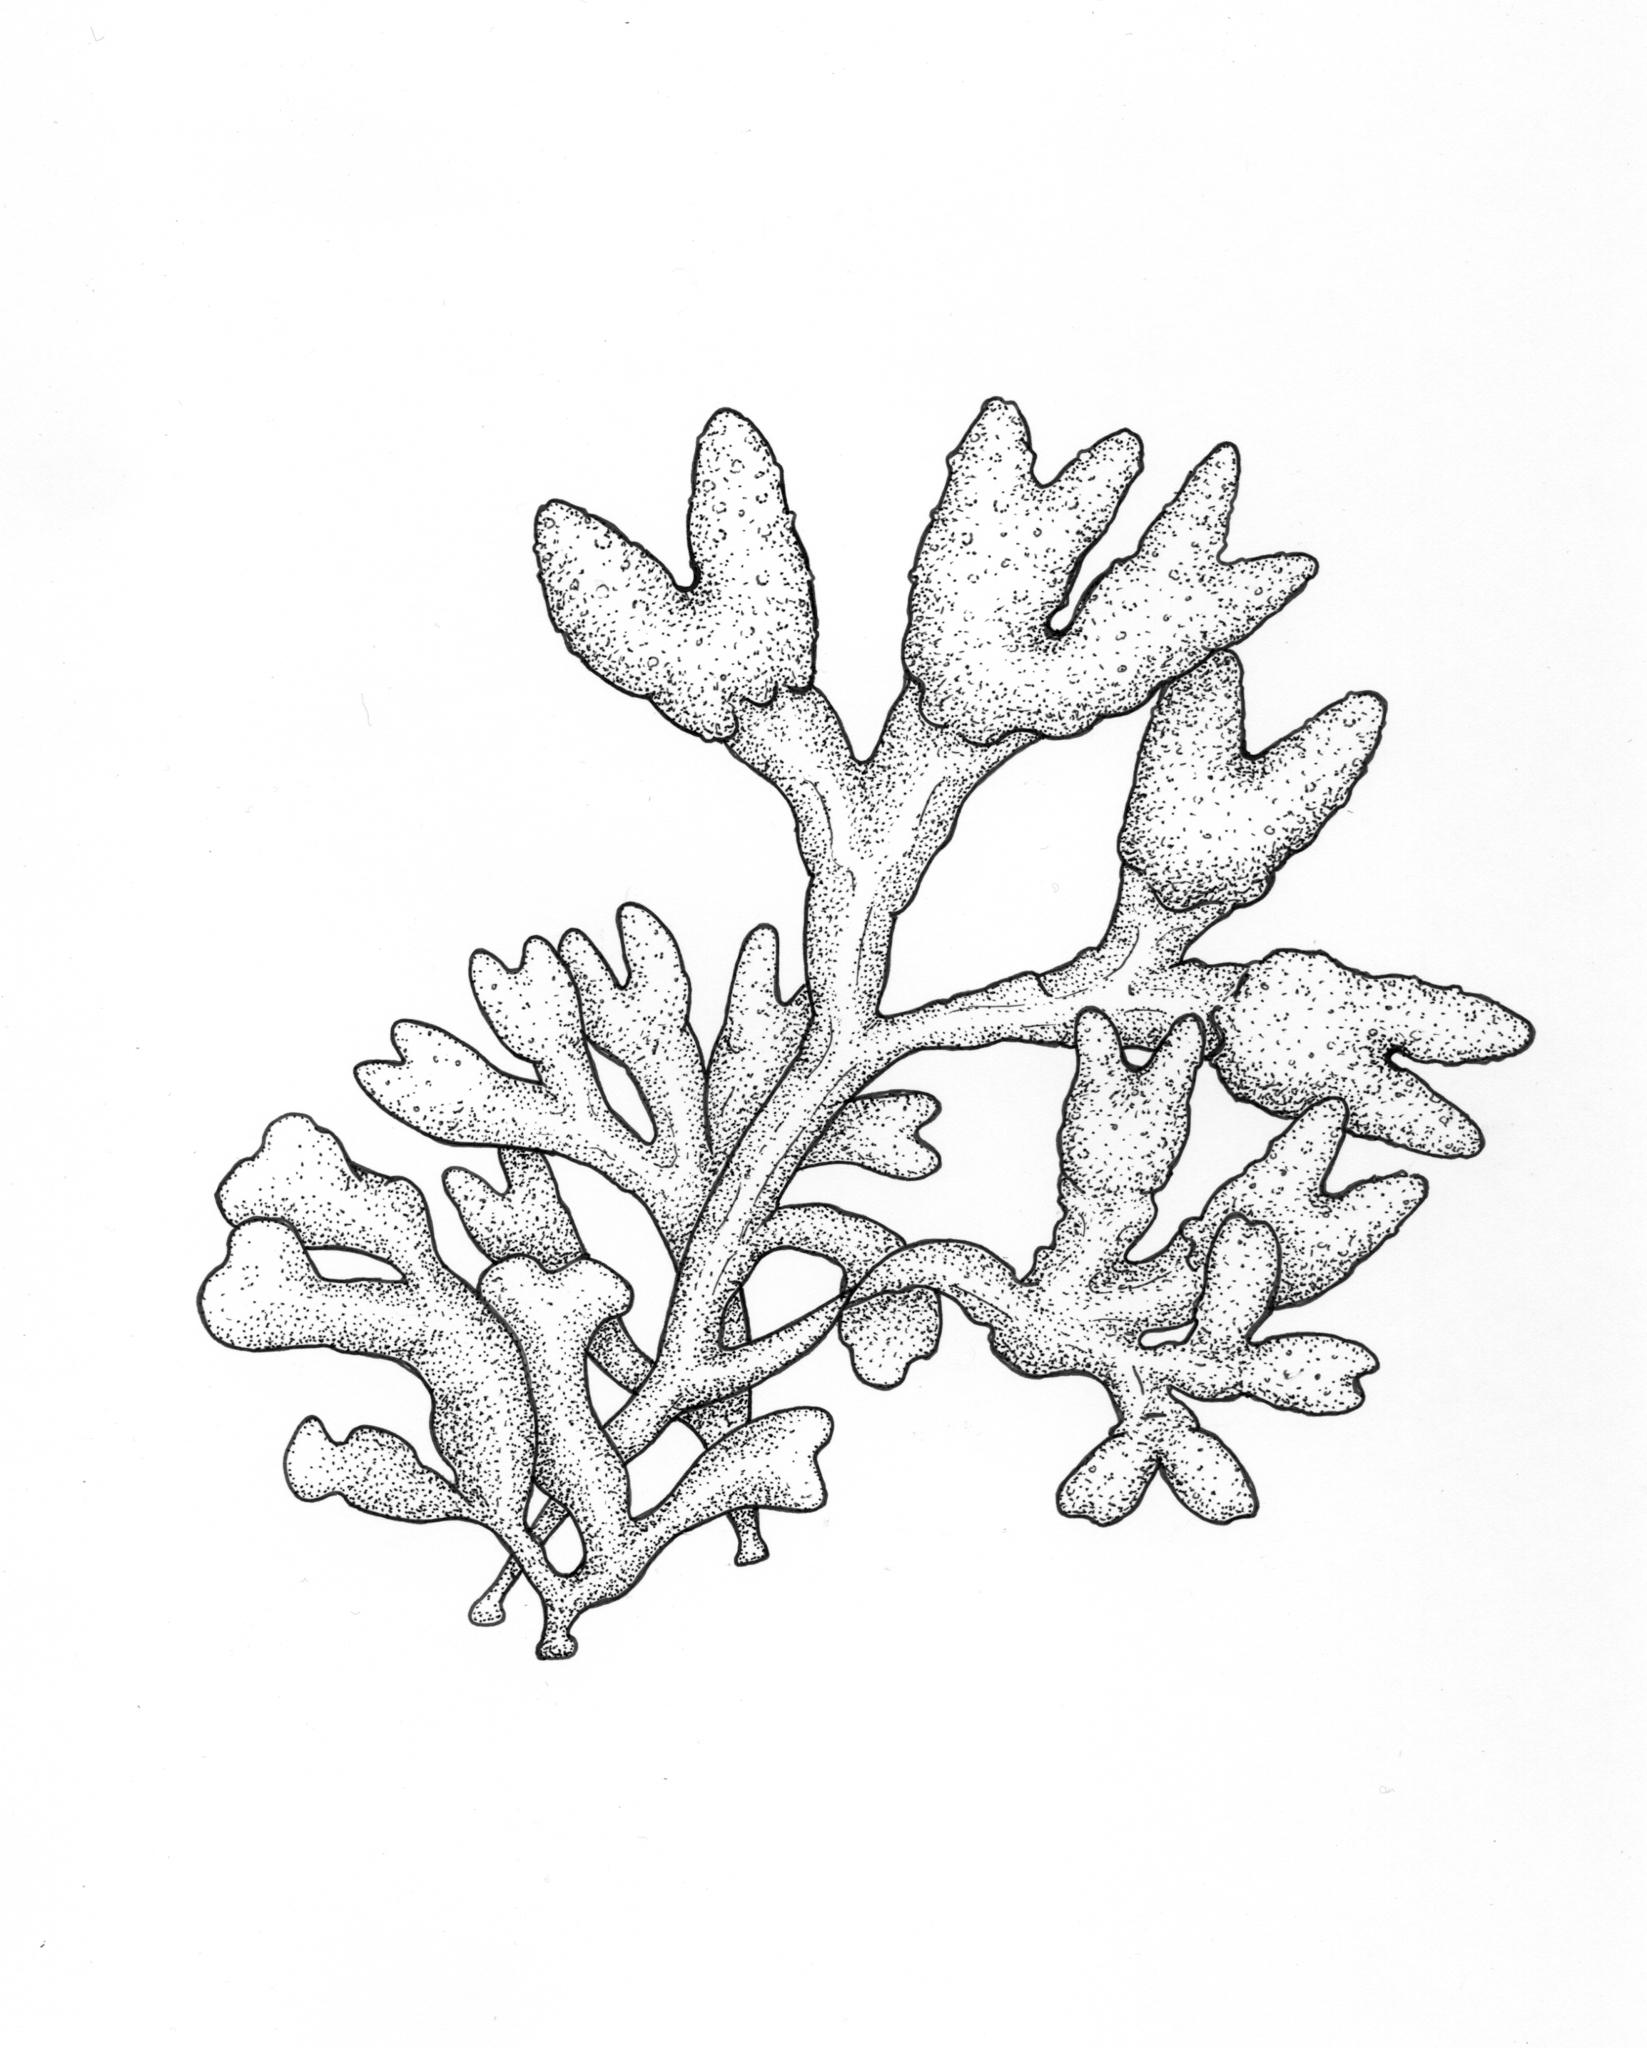 Popweed Rockweed Fucus drawing